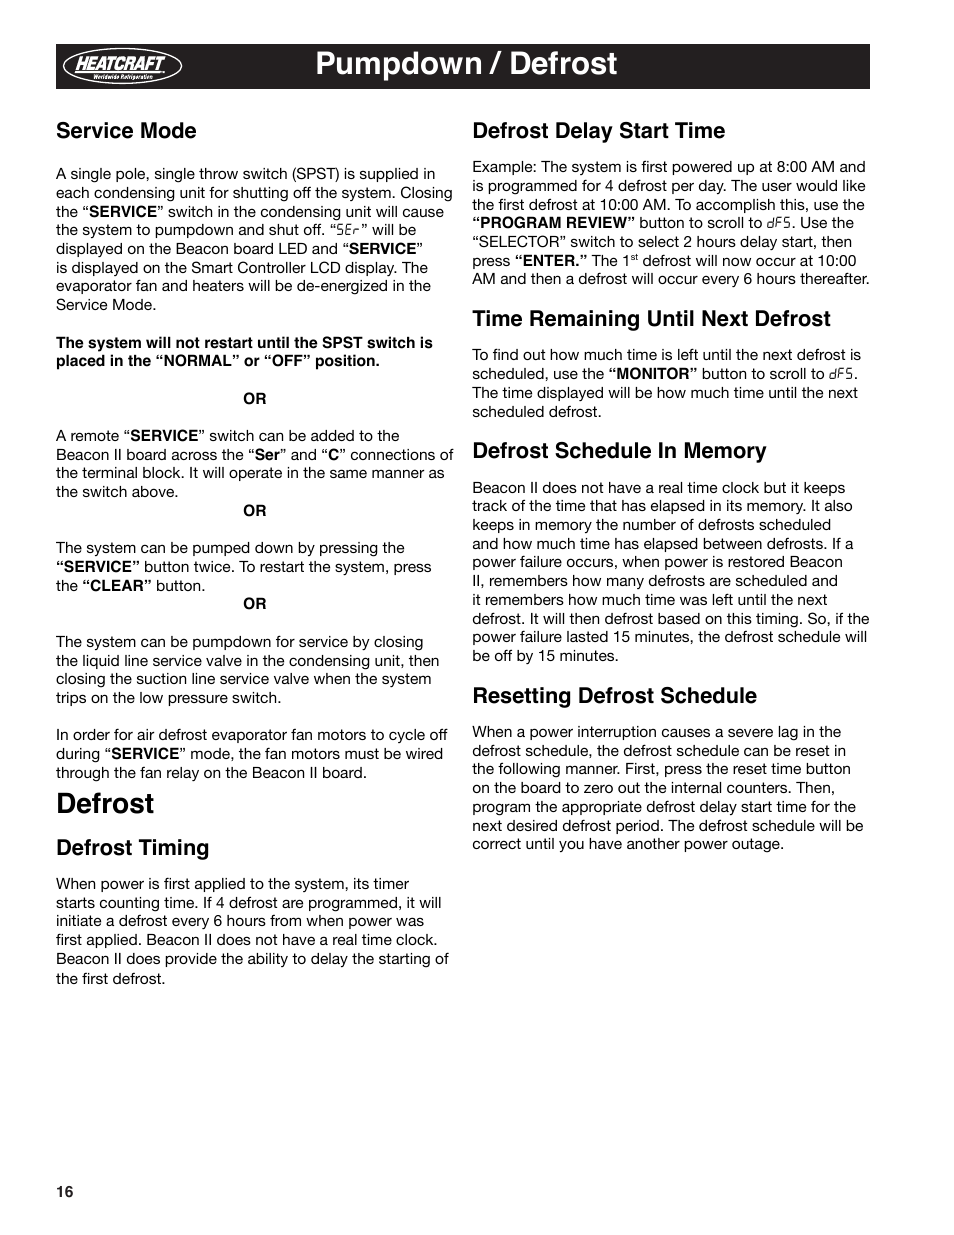 Pumpdown / defrost, Defrost, Defrost delay start time